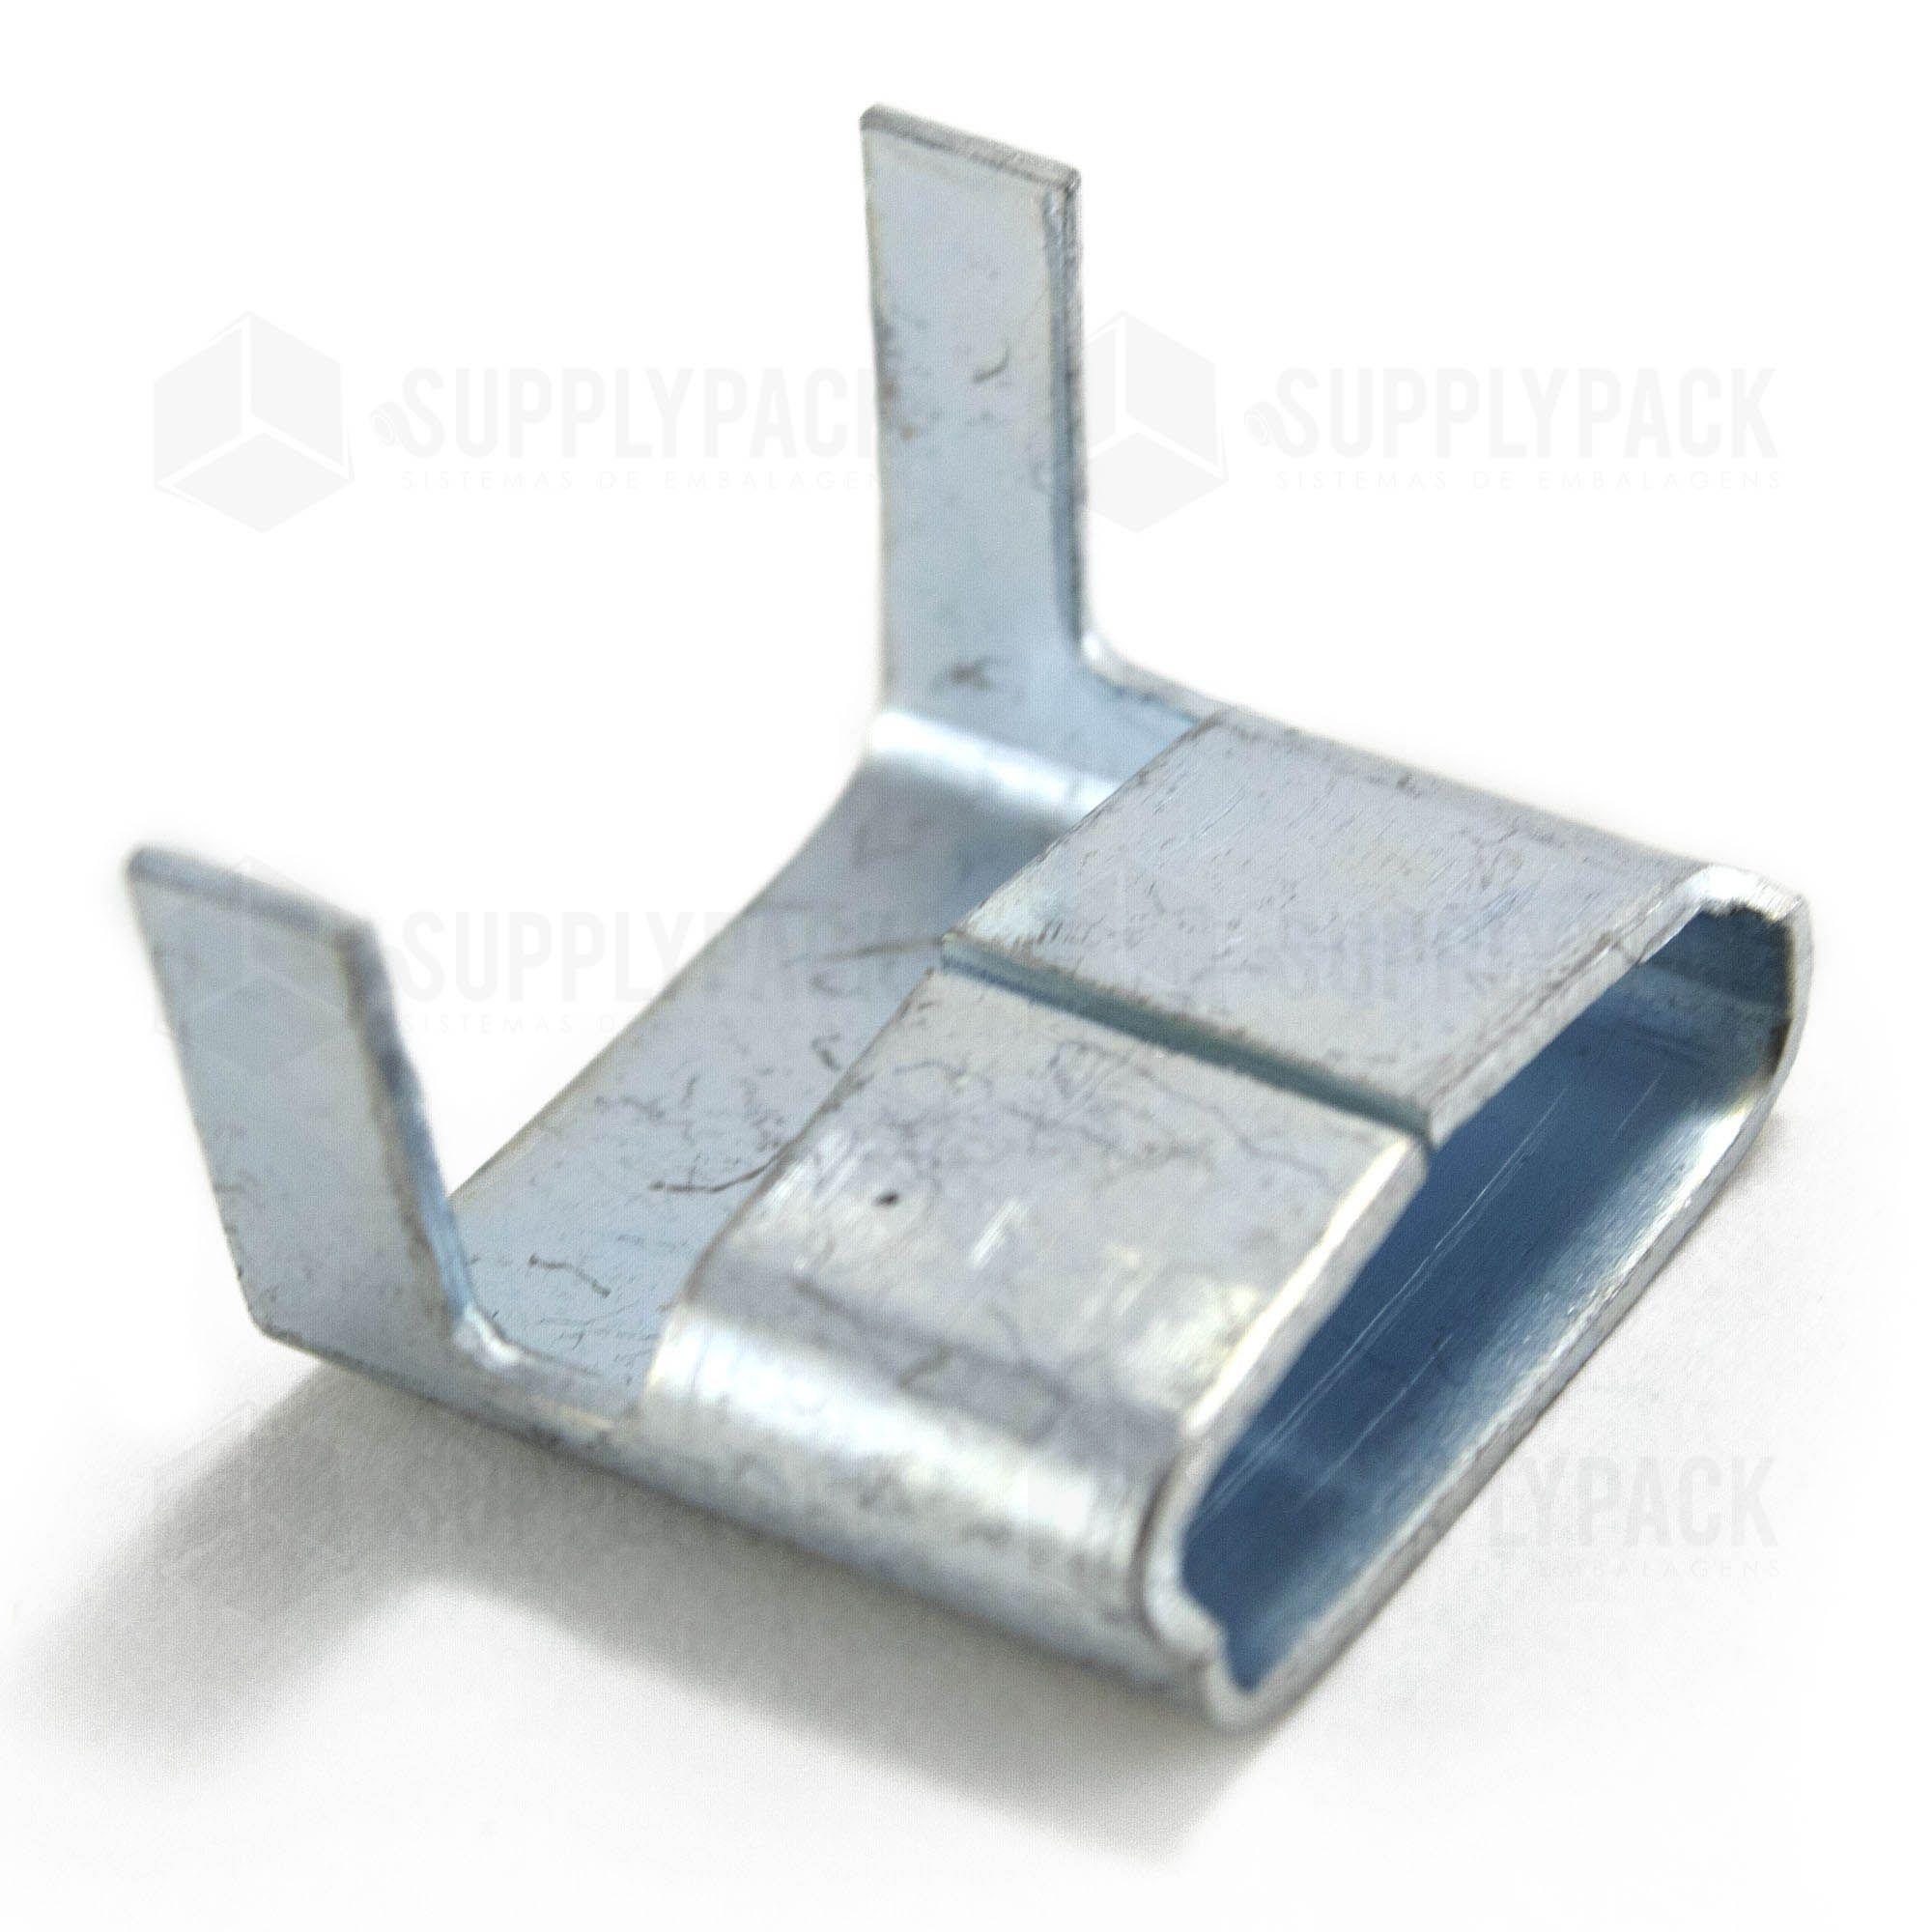 Selo Metálico VR p/ Fita de Aço 13mm KG Supplypack